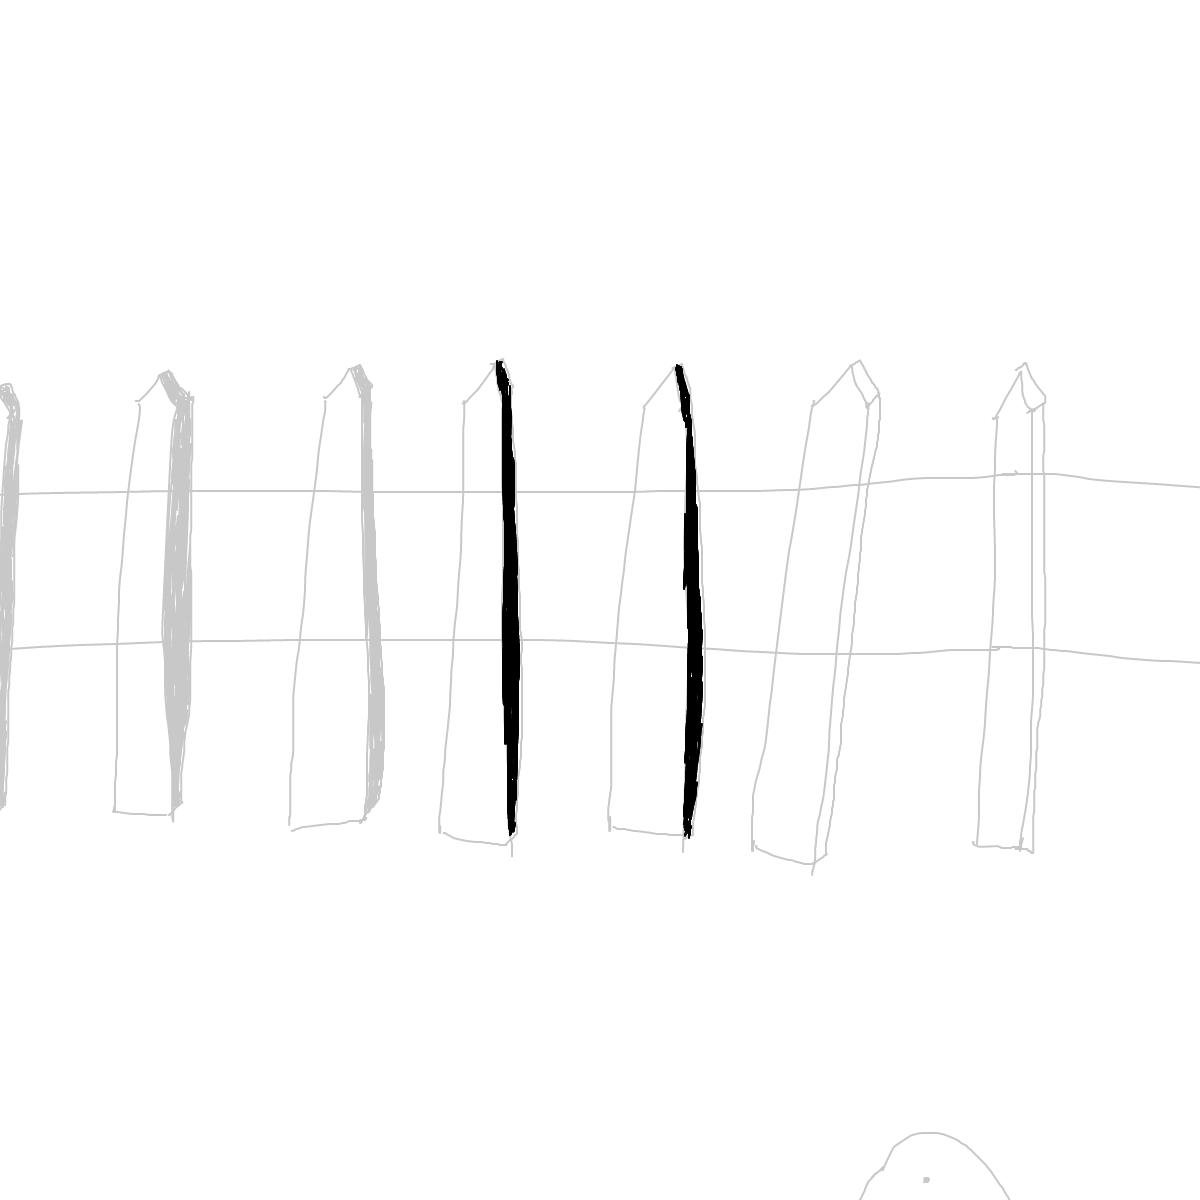 BAAAM drawing#9665 lat:52.4750747680664060lng: 13.4067440032958980